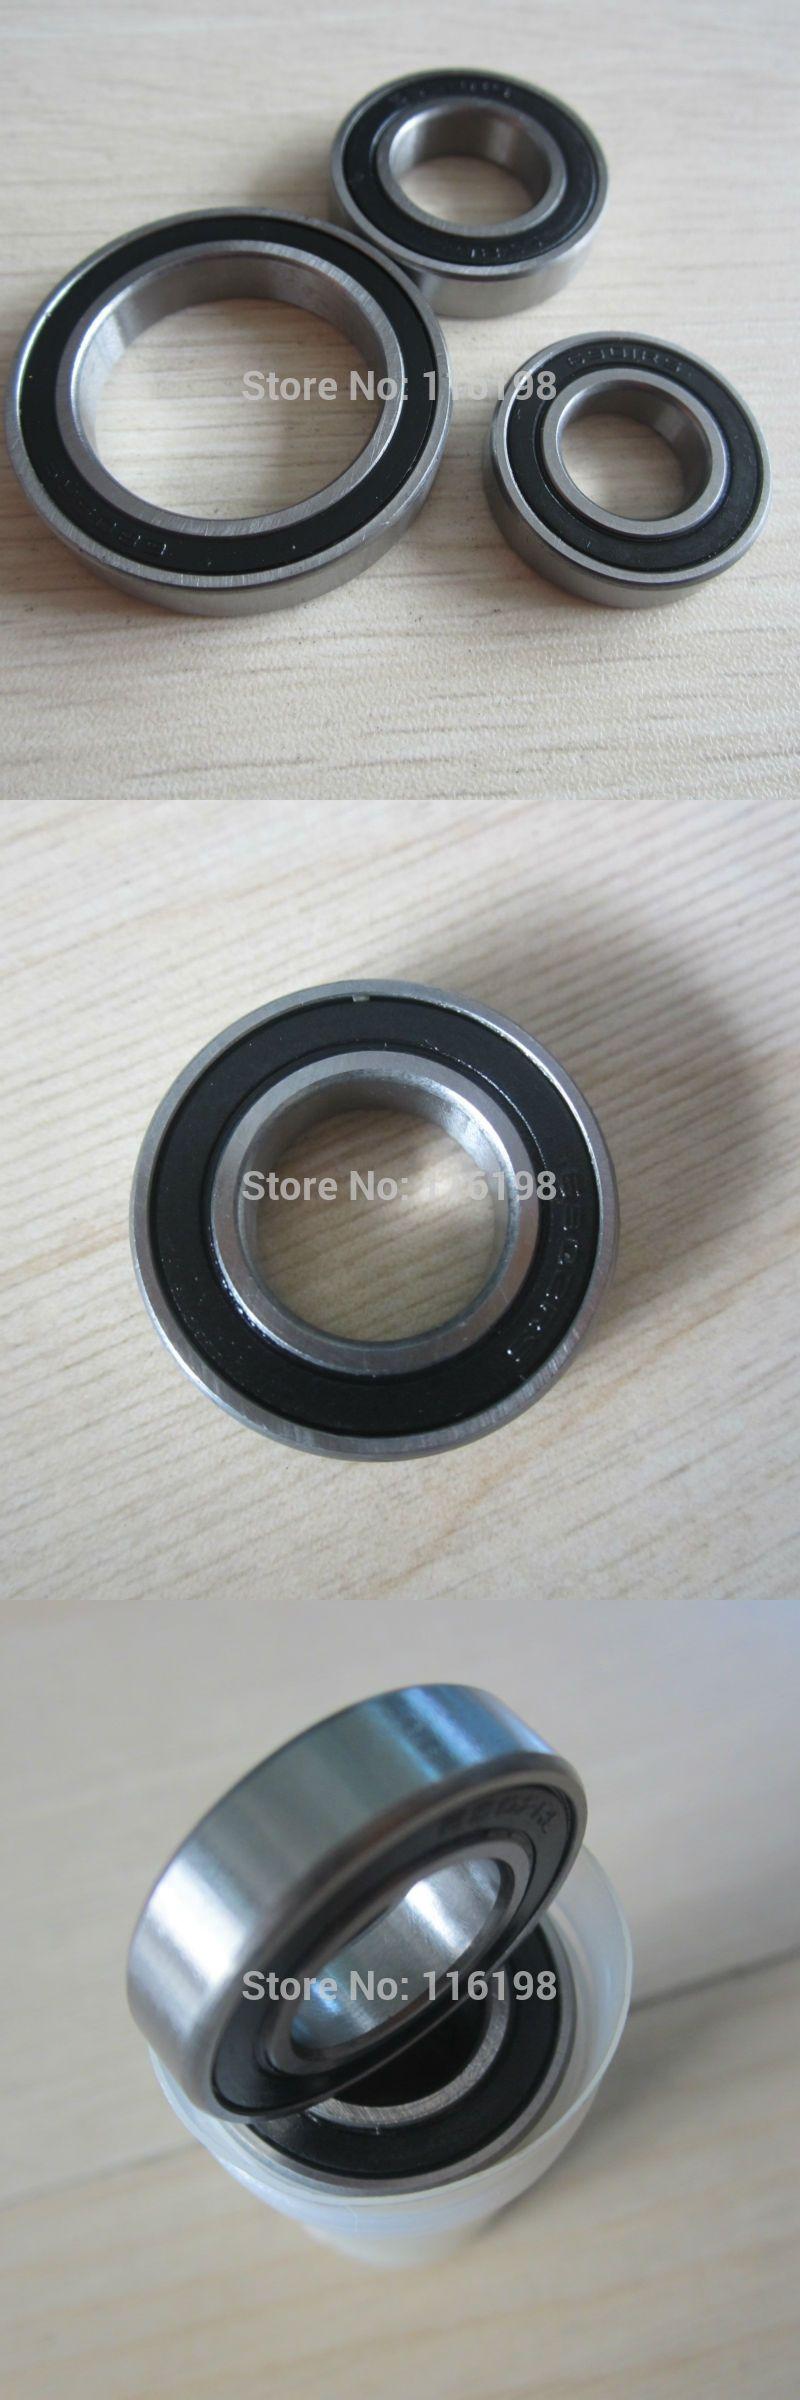 6200RS 6200 2RS 6200 chrome steel bearing deep groove ball bearing